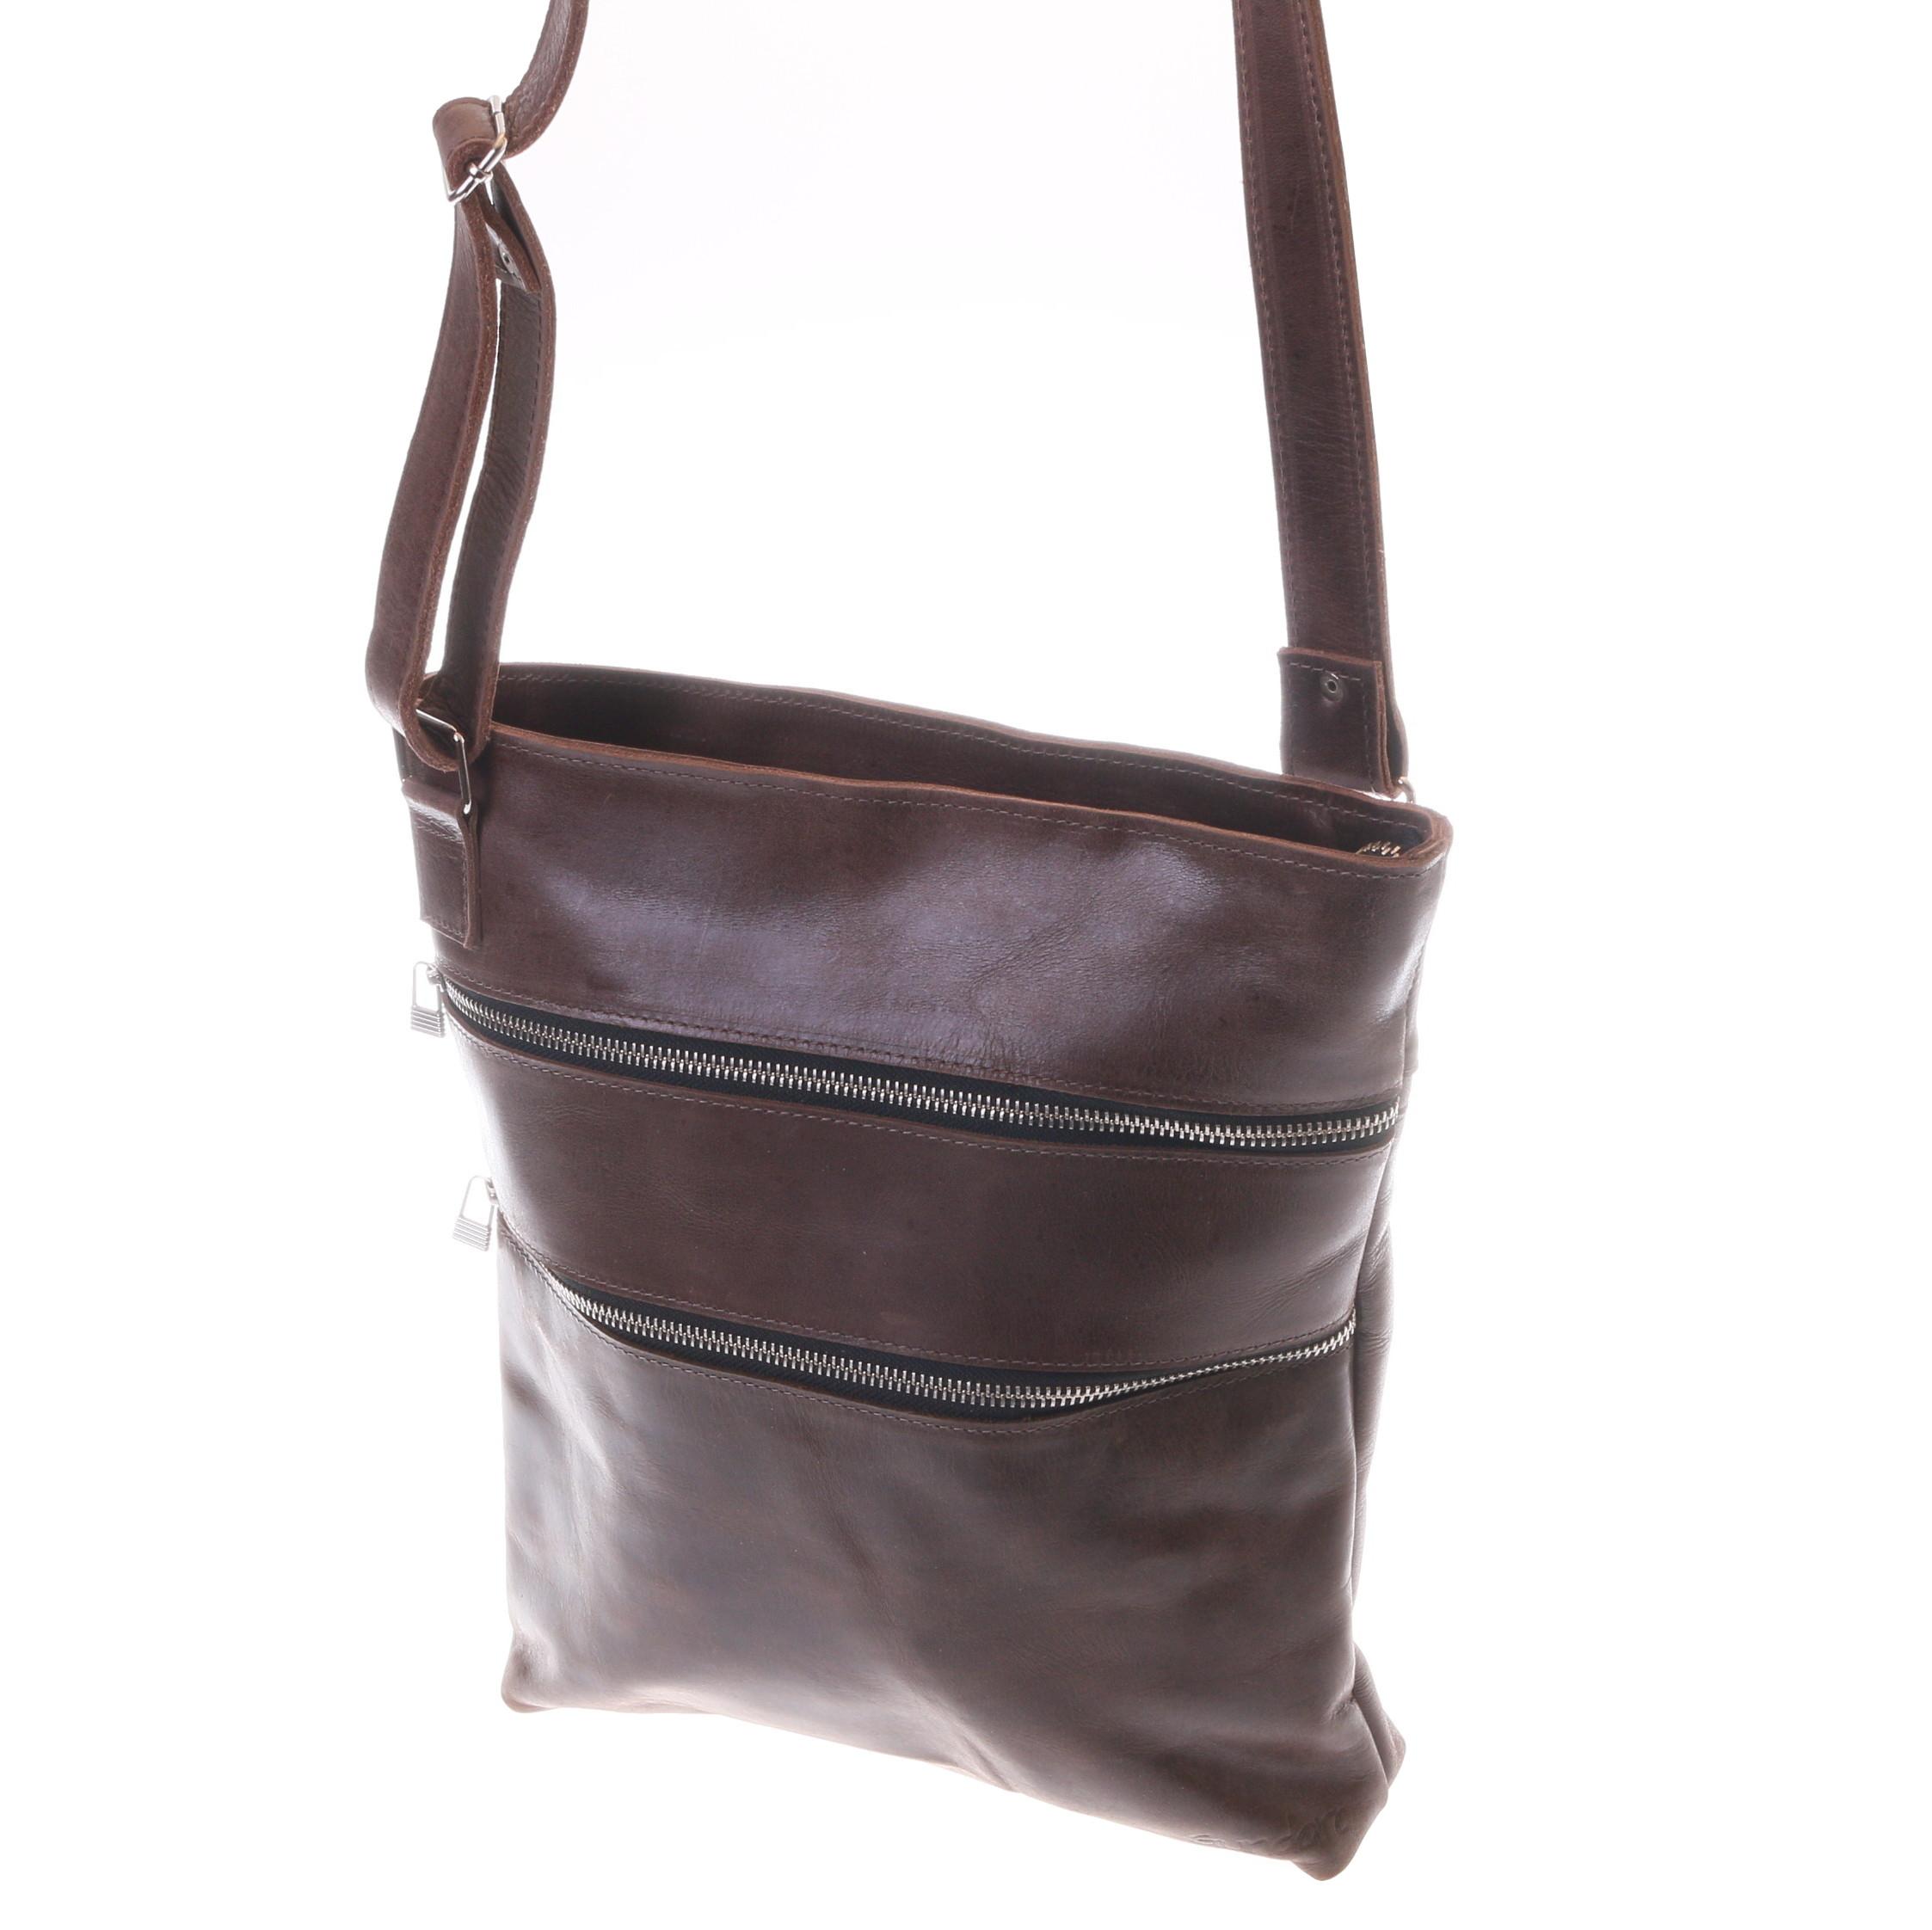 Gundara - fair crossbody leather bag - genuine cow leather from Ethiopia - handmade & fair